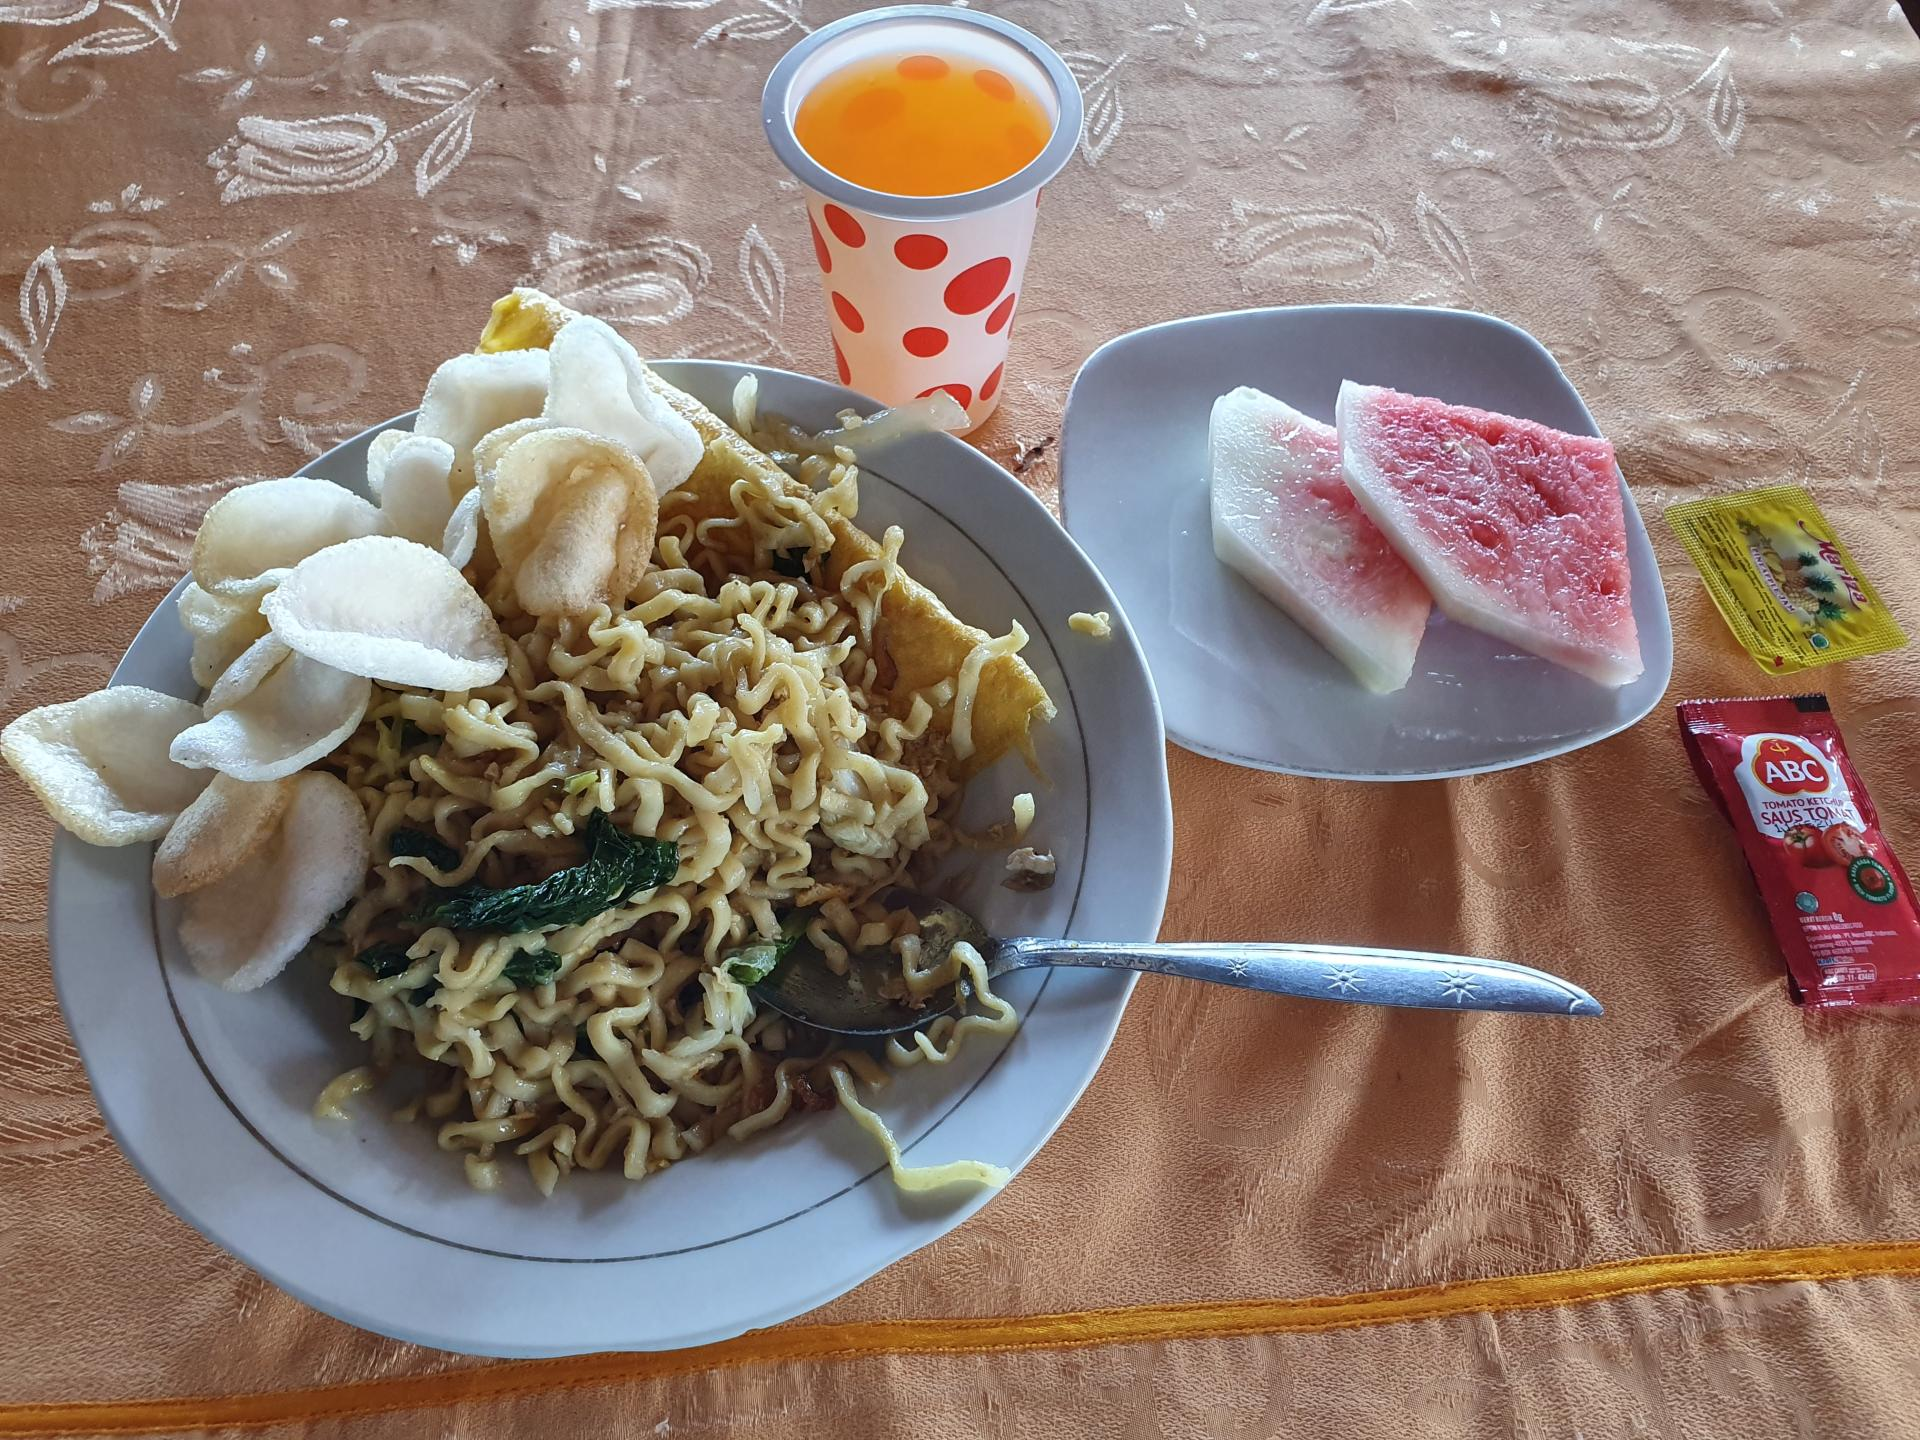 завтрак в Индонезии